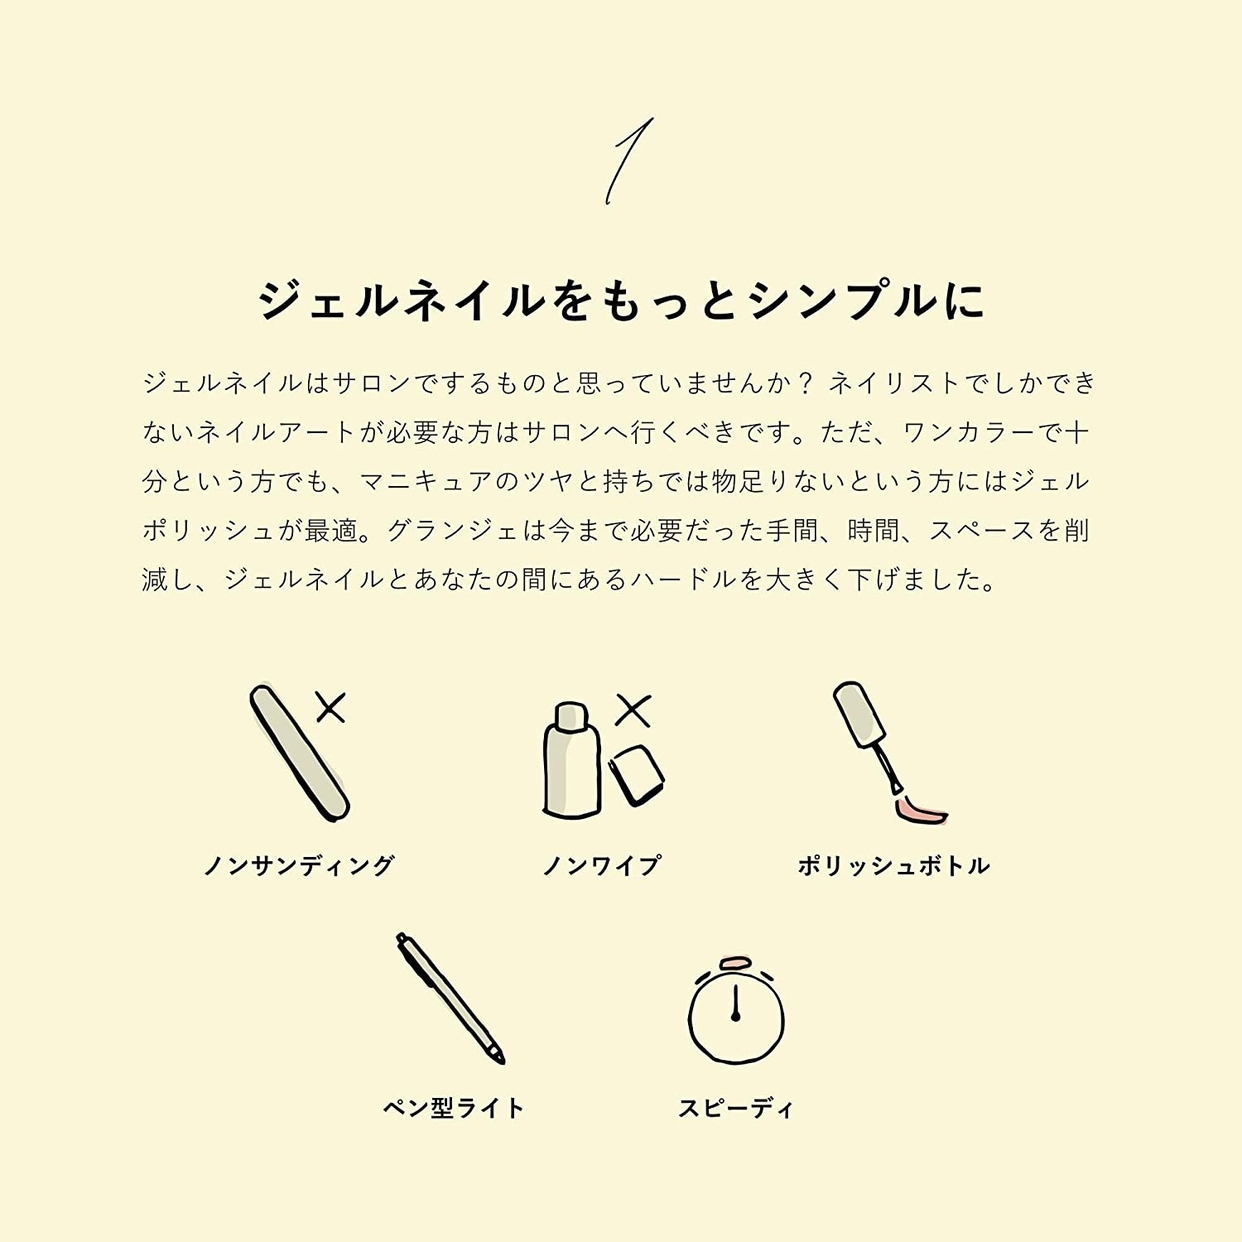 GRANJE(グランジェ) ジェルポリッシュセットの商品画像3